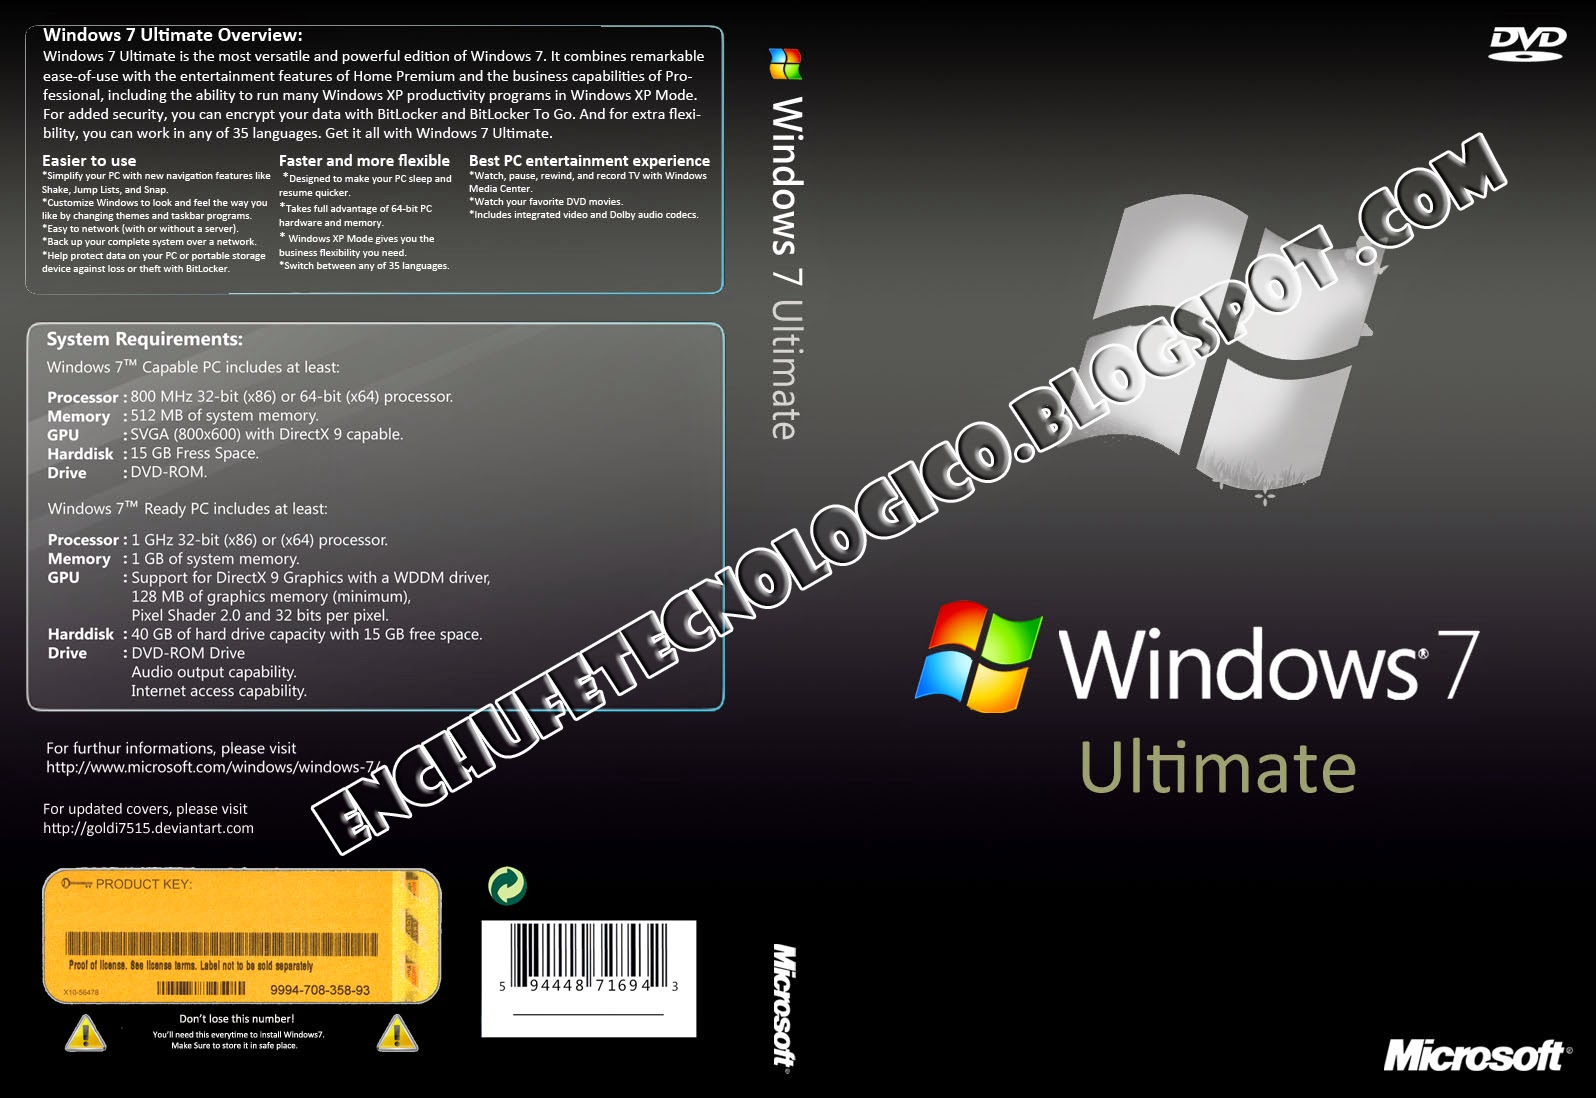 descargar windows 7 desde microsoft